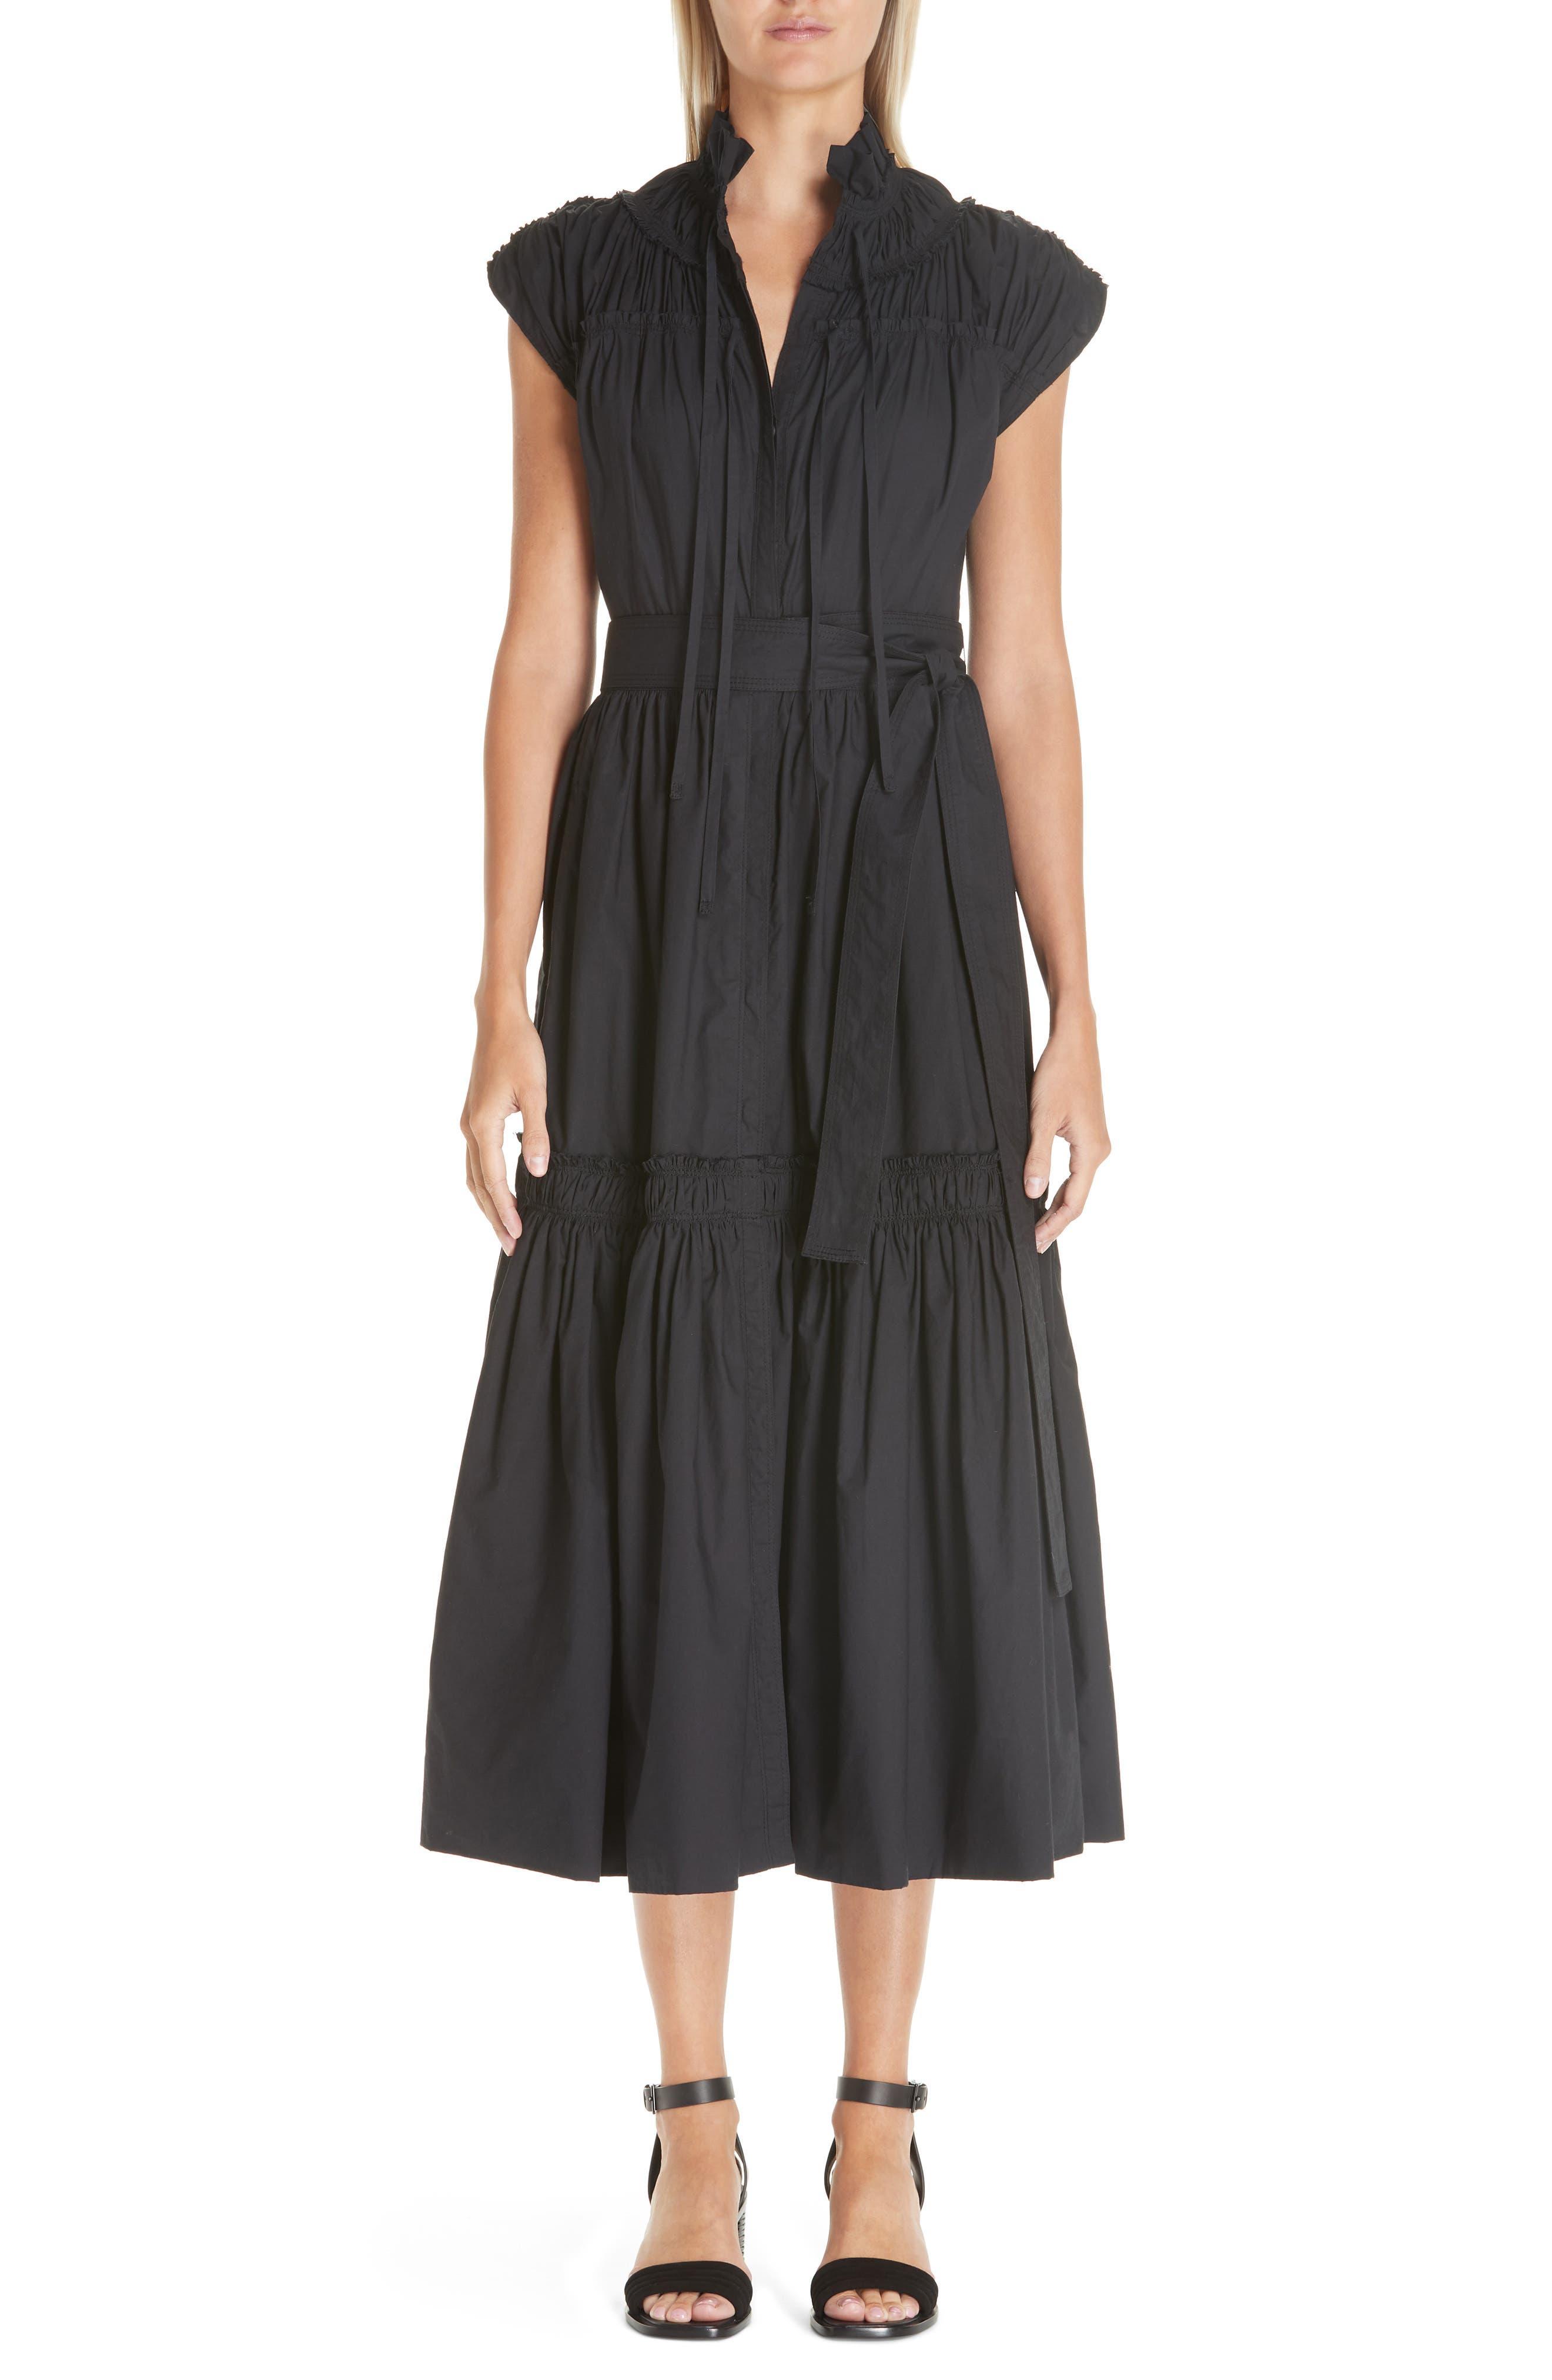 Proenza Schouler Smocked Poplin Dress, Black